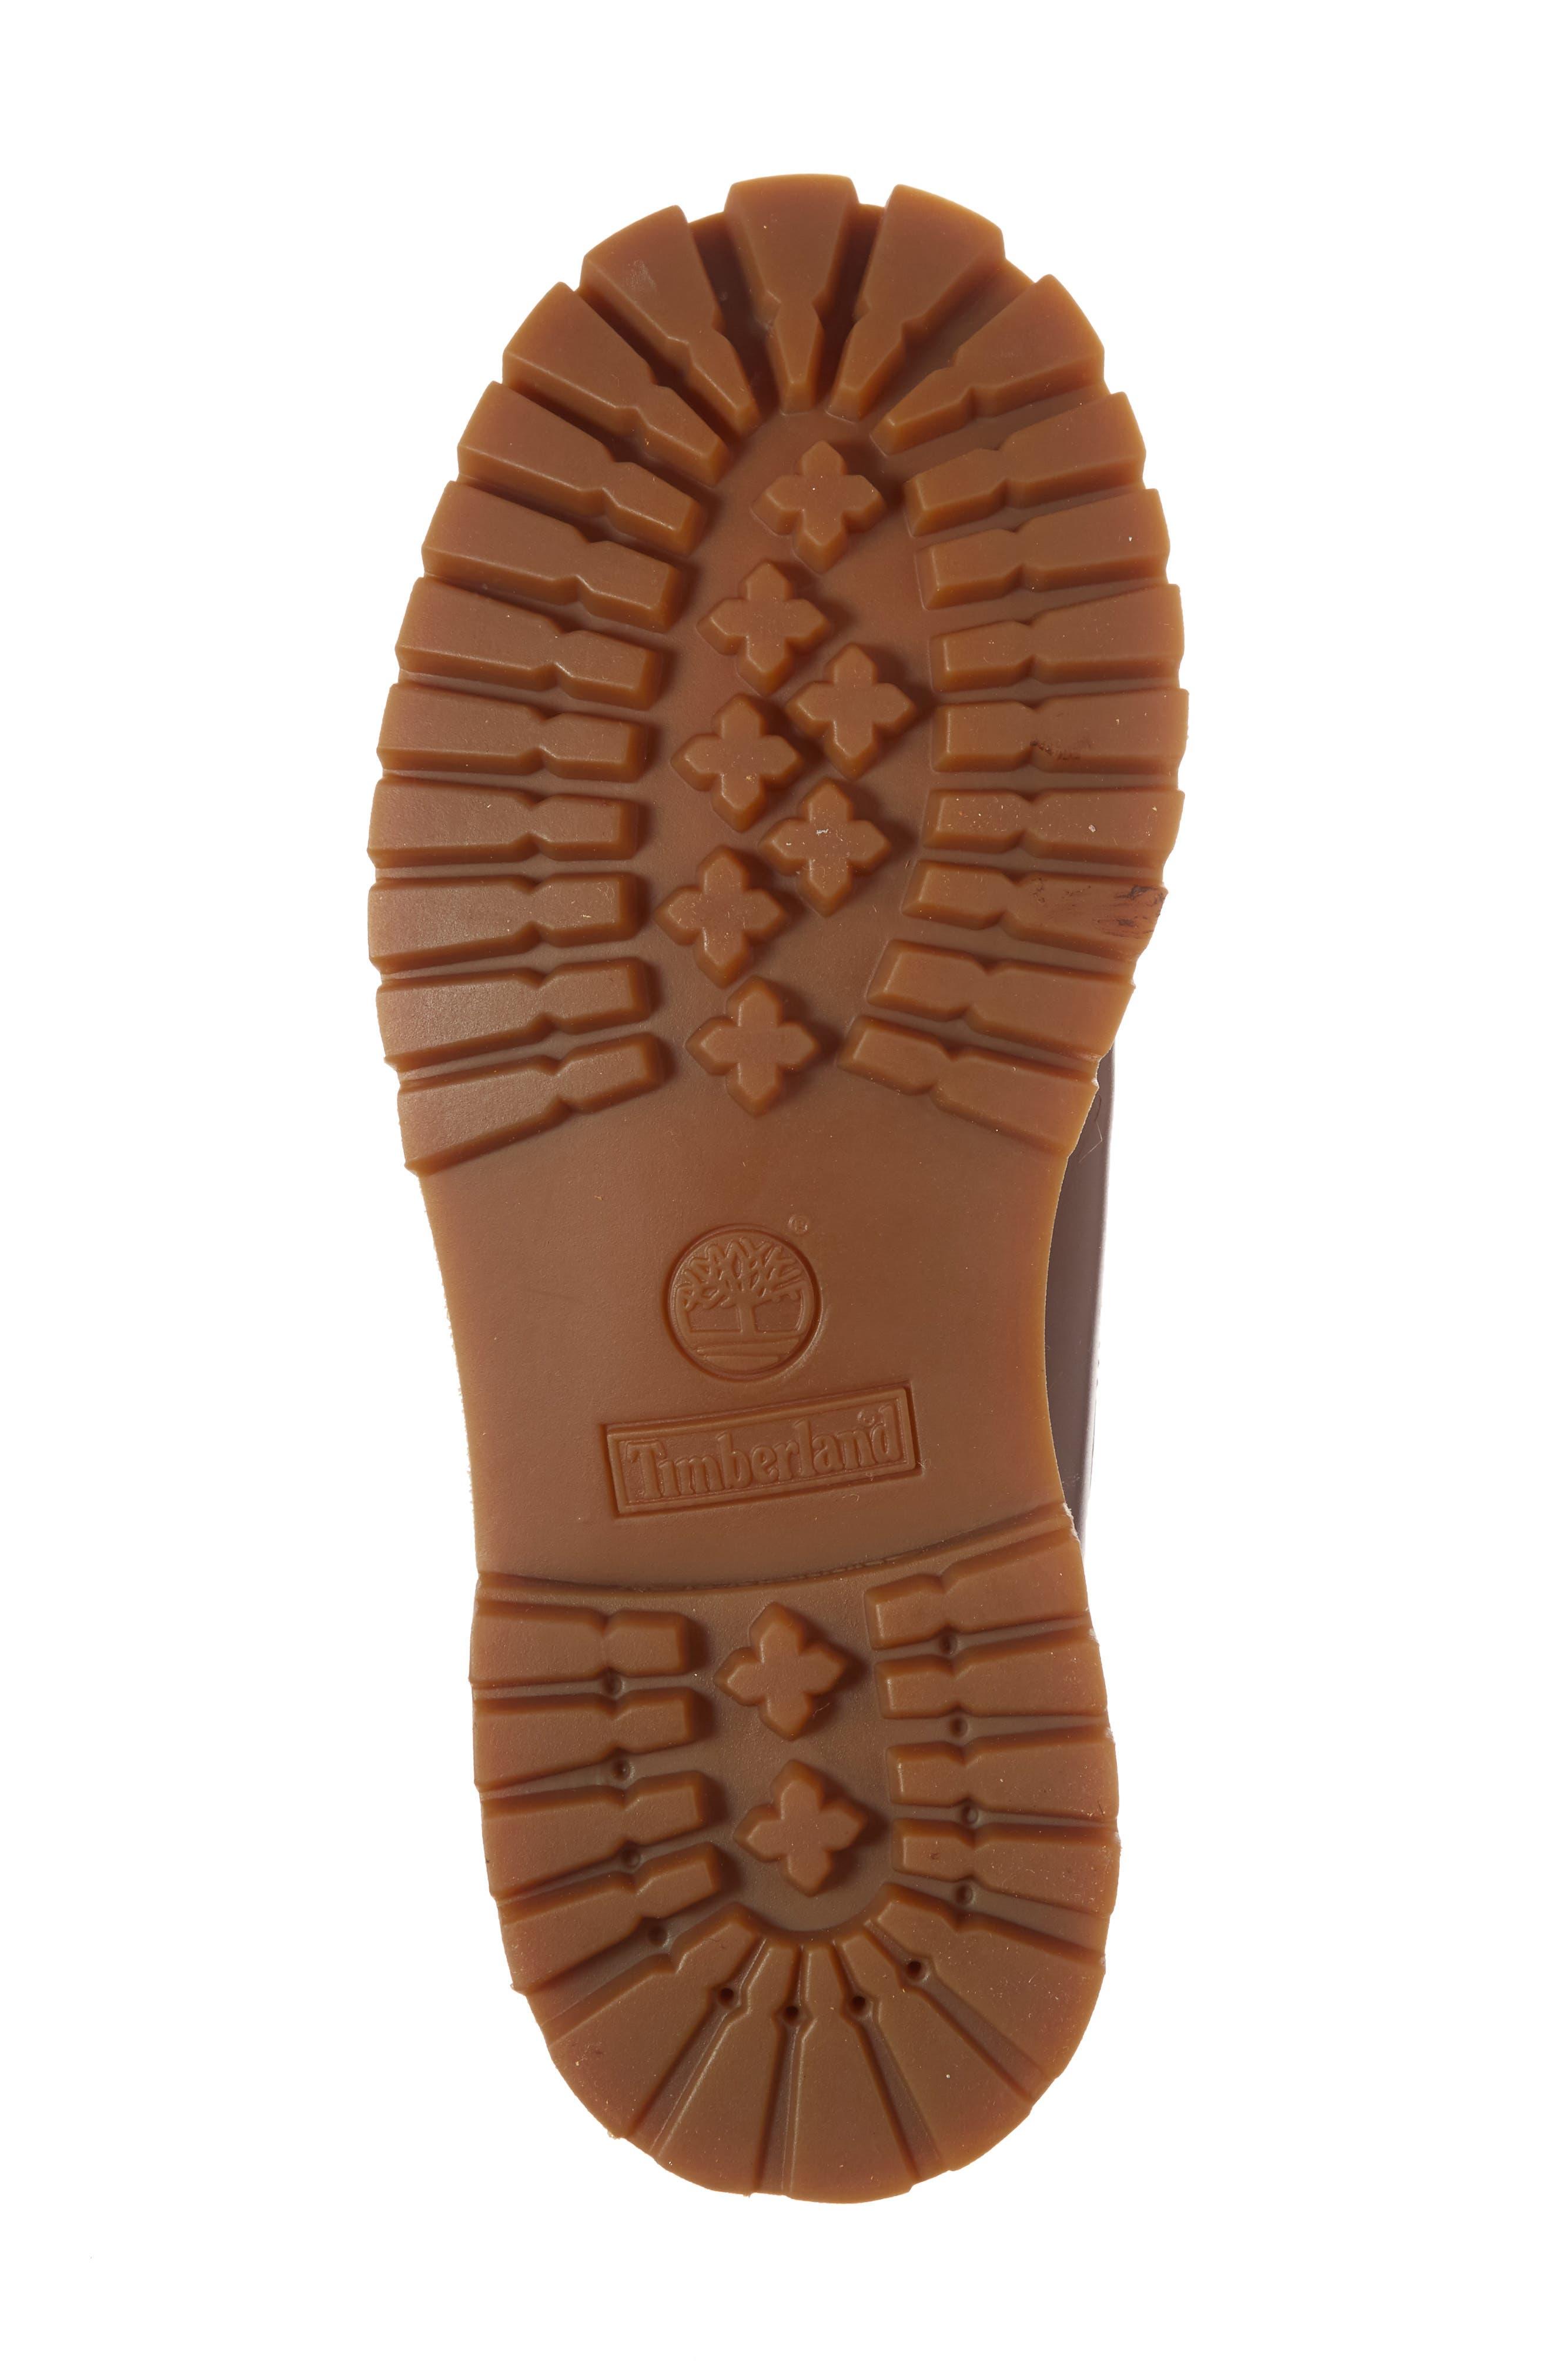 6-Inch Premium Waterproof PrimaLoft<sup>®</sup> Insulated Boot,                             Alternate thumbnail 6, color,                             Wheat Quartz Exotic